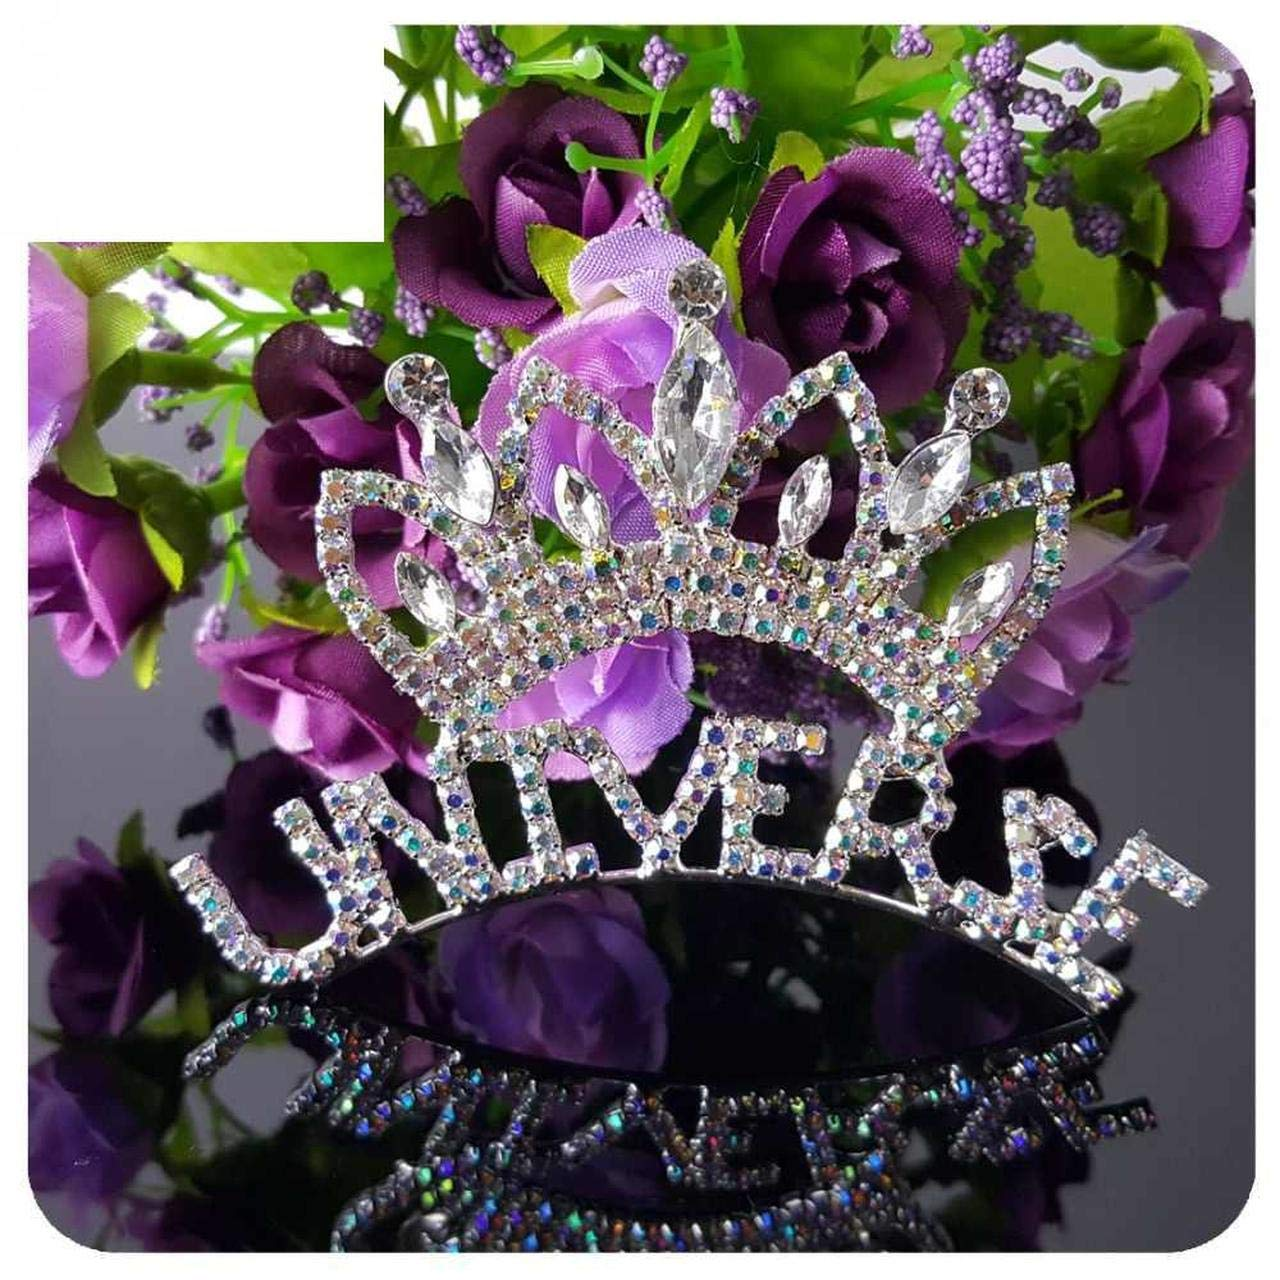 Grandbling Rhinestone Universe Queen Brooches Brooch Pin Badge Emblem Corsage Beauty Pageant Crown Tiara